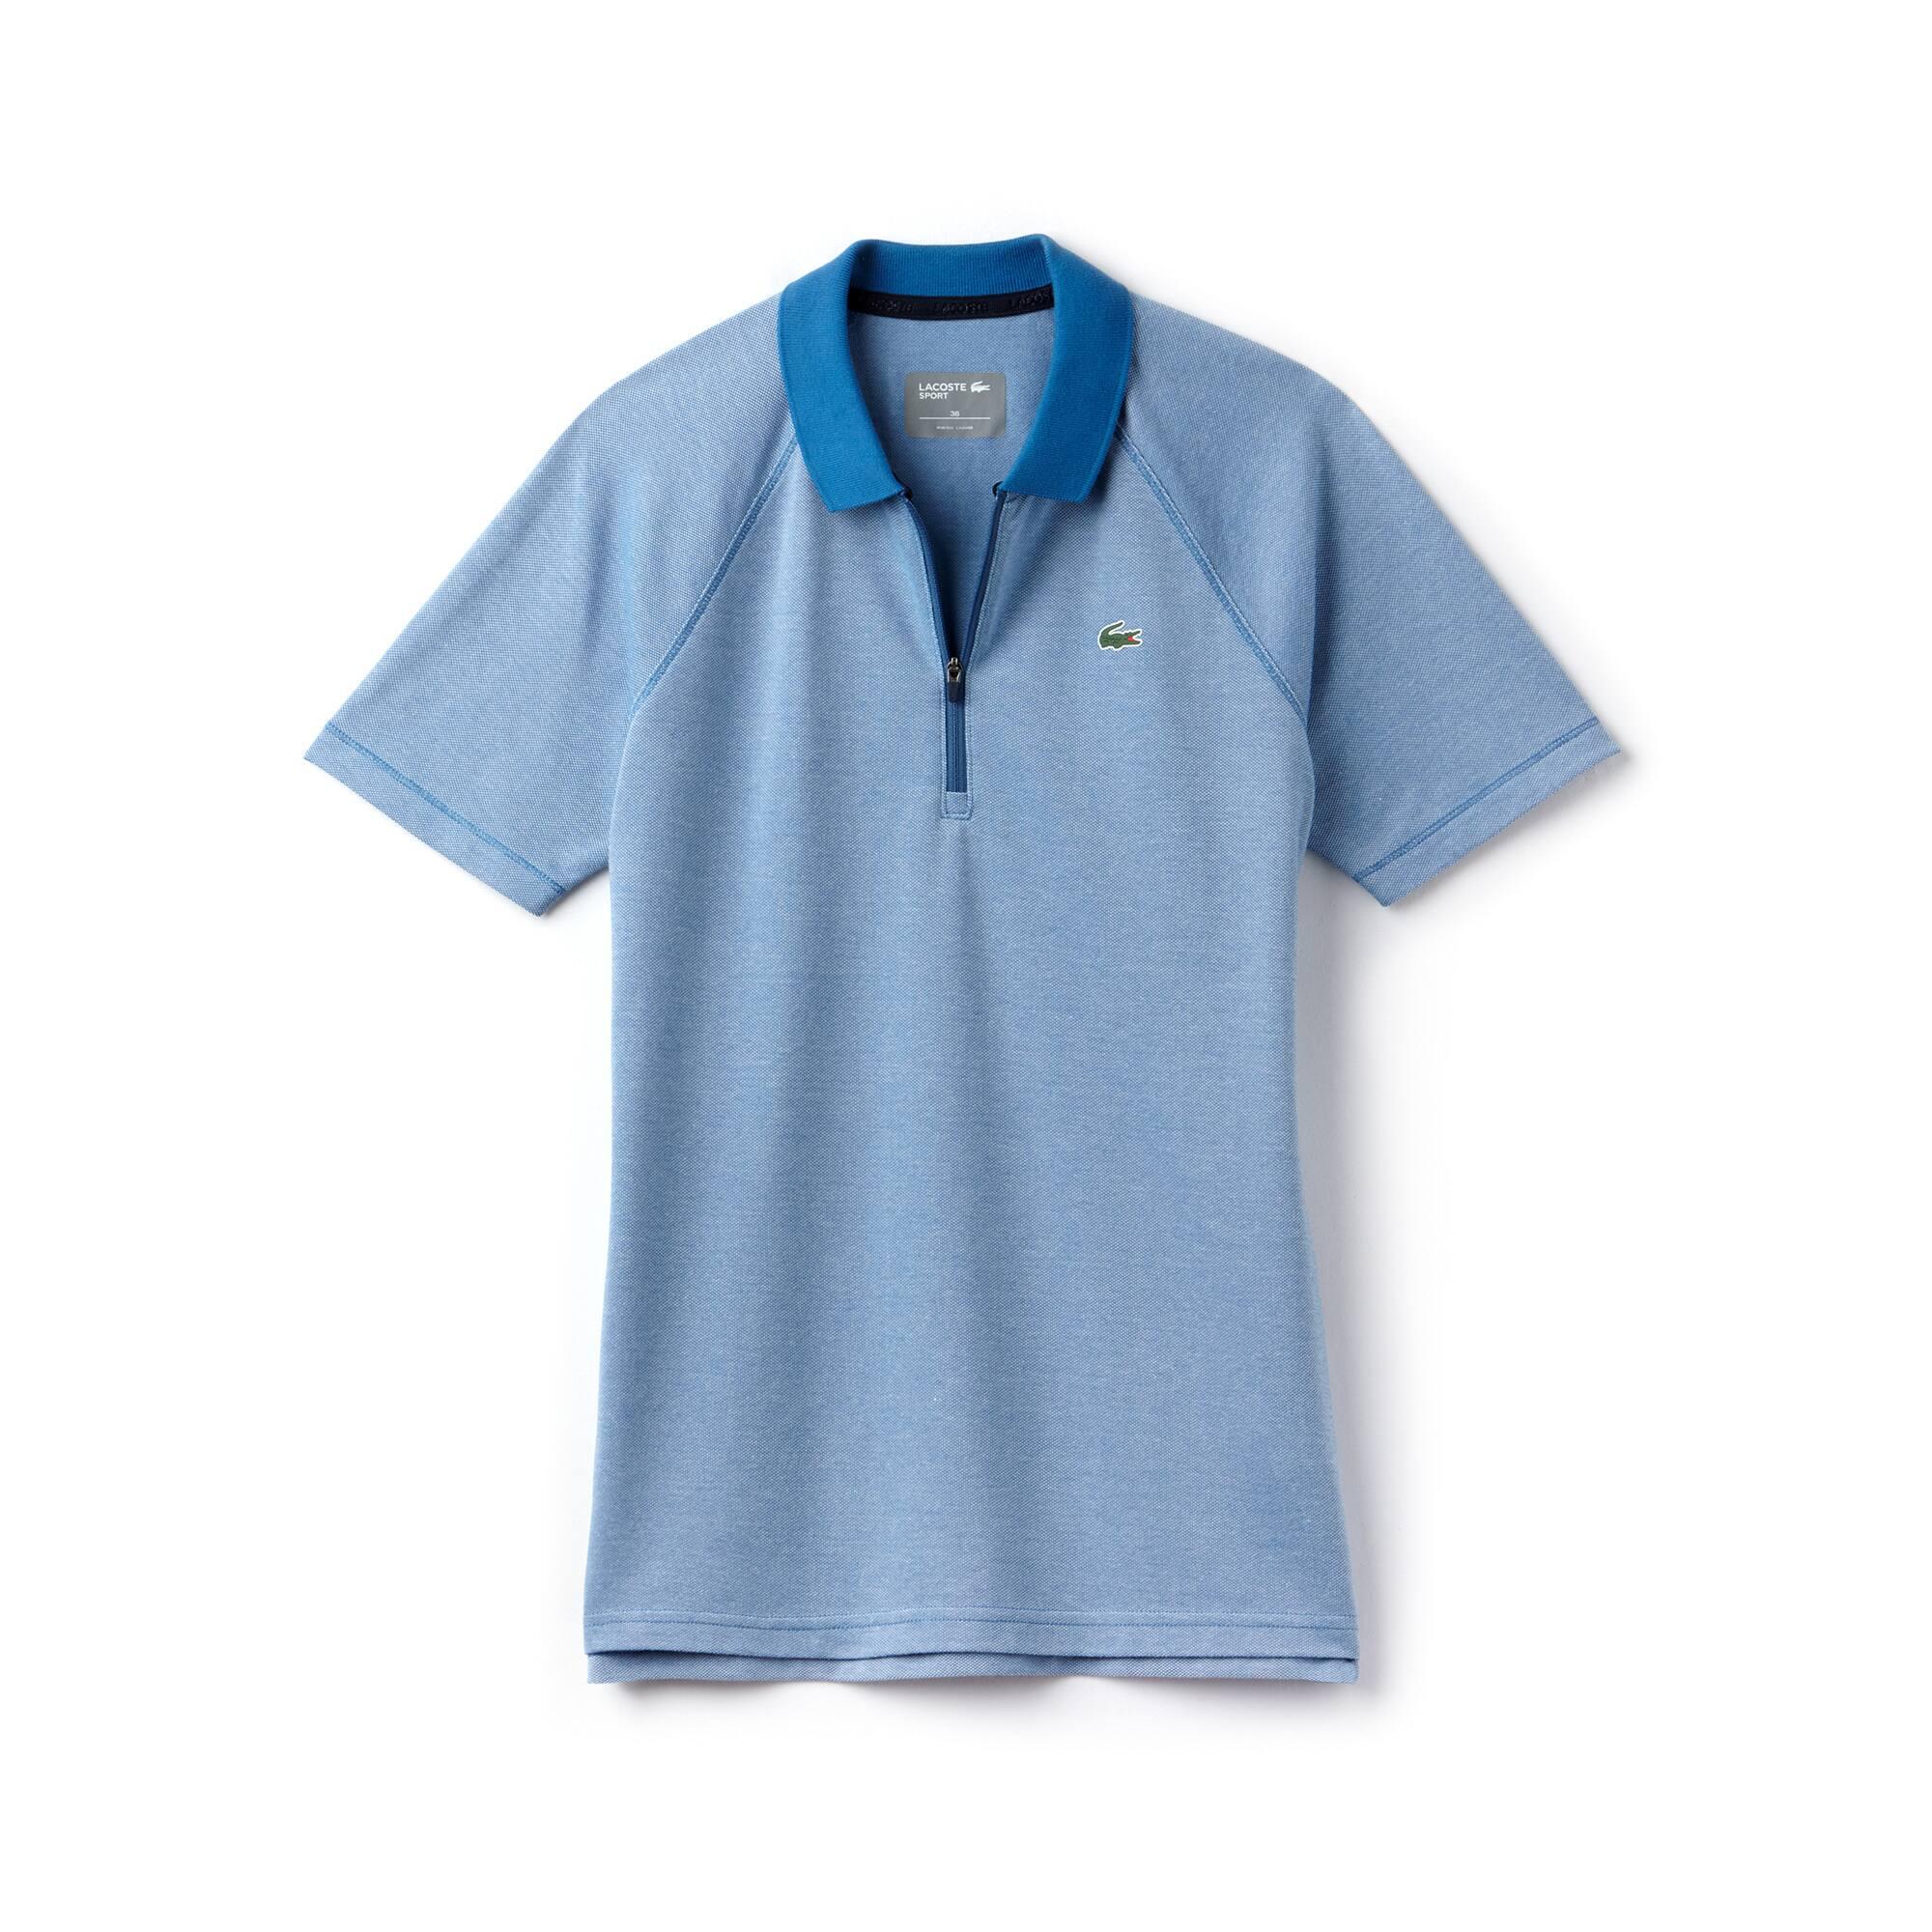 Women's Lacoste SPORT Zip Neck Technical Jersey Golf Polo